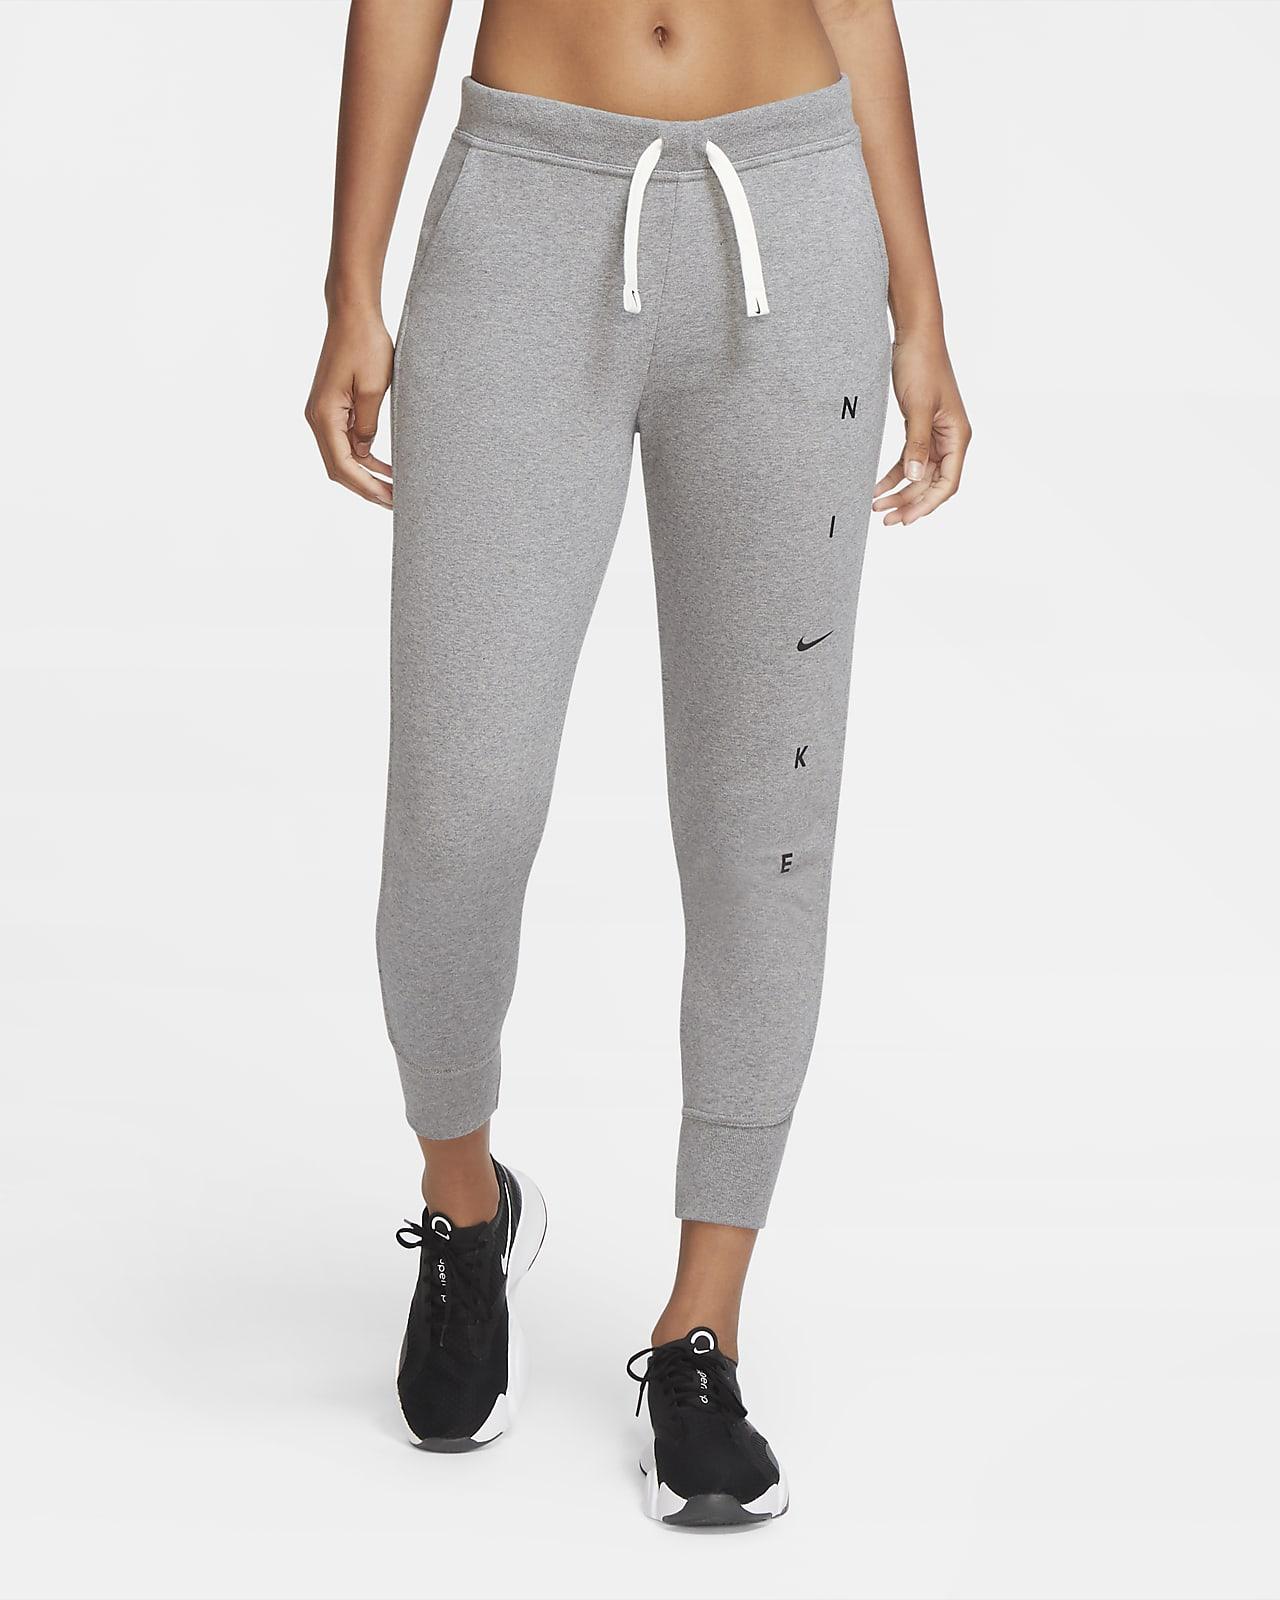 Nike Dri-FIT Get Fit Damen-Trainingshose mit Grafik